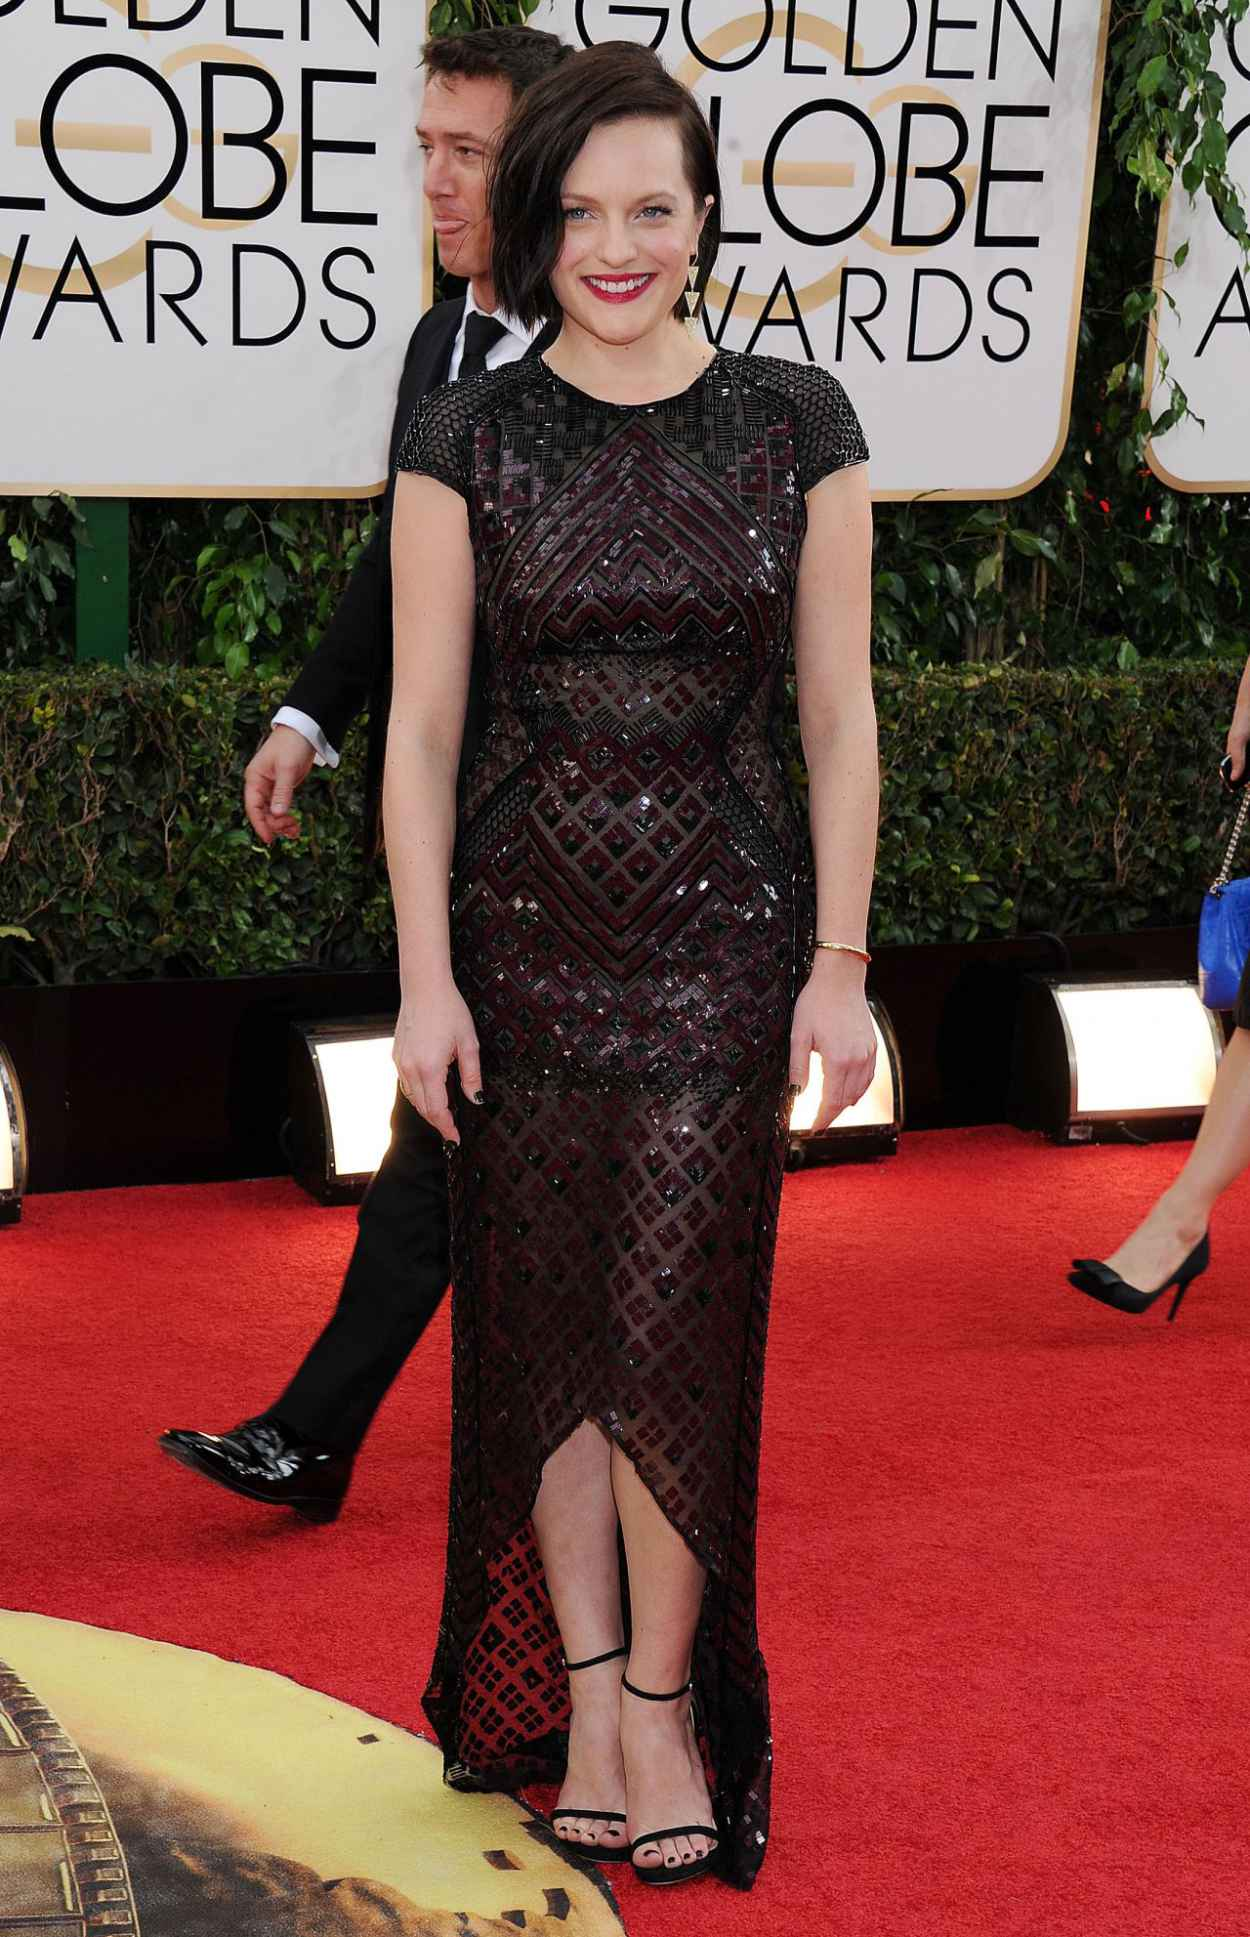 Elisabeth Moss Wears J. Mendel at 71st Annual Golden Globe Awards Red Carpet-1